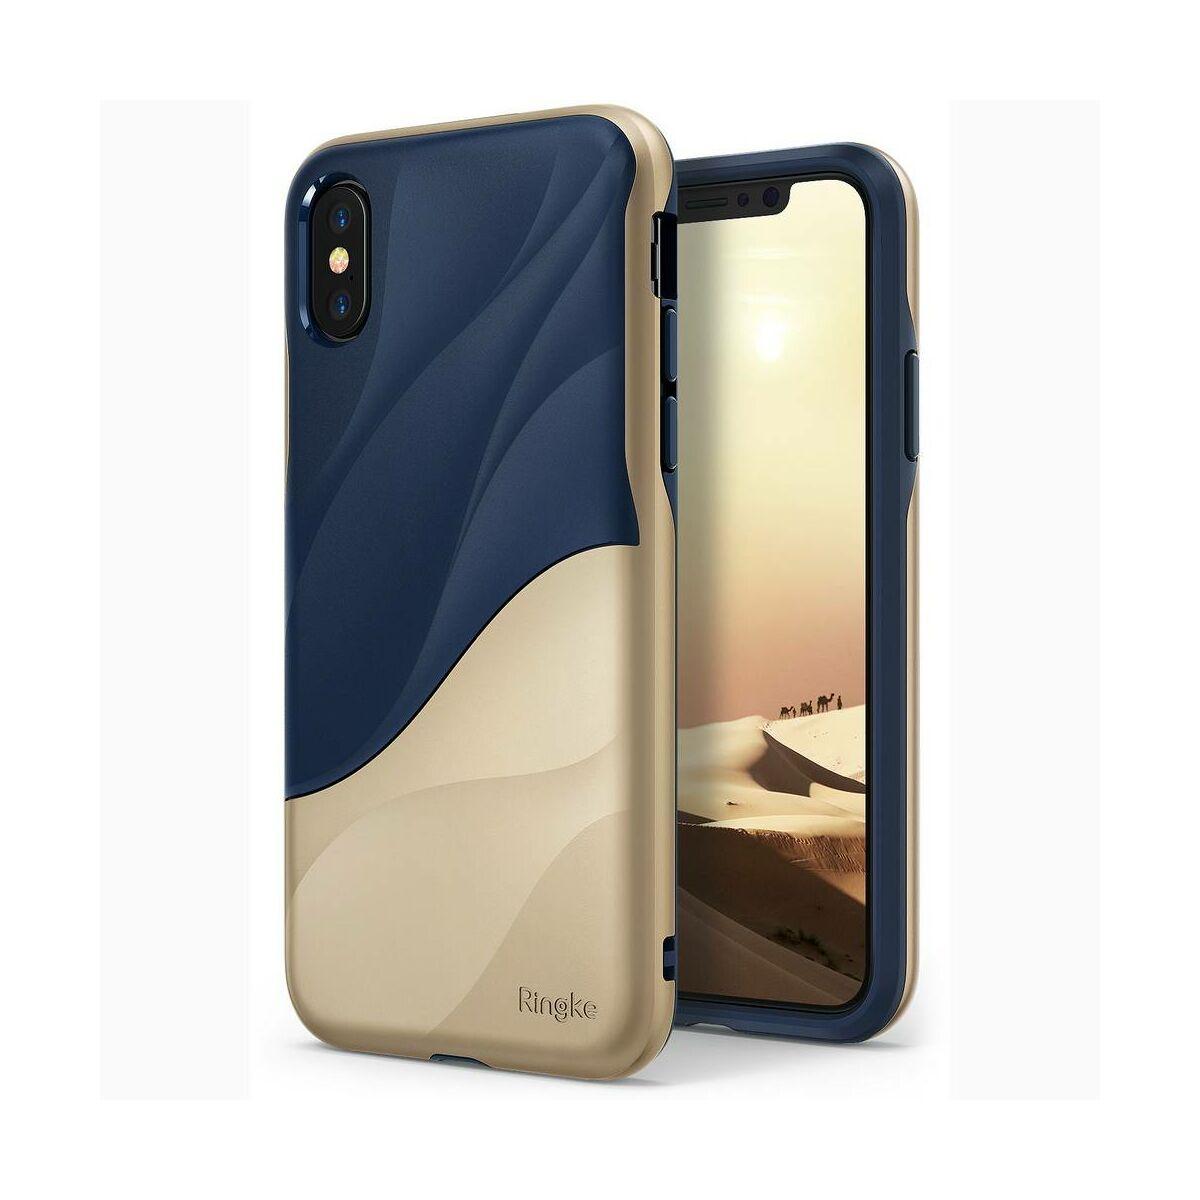 Ringke iPhone X/XS tok, Wave, arany